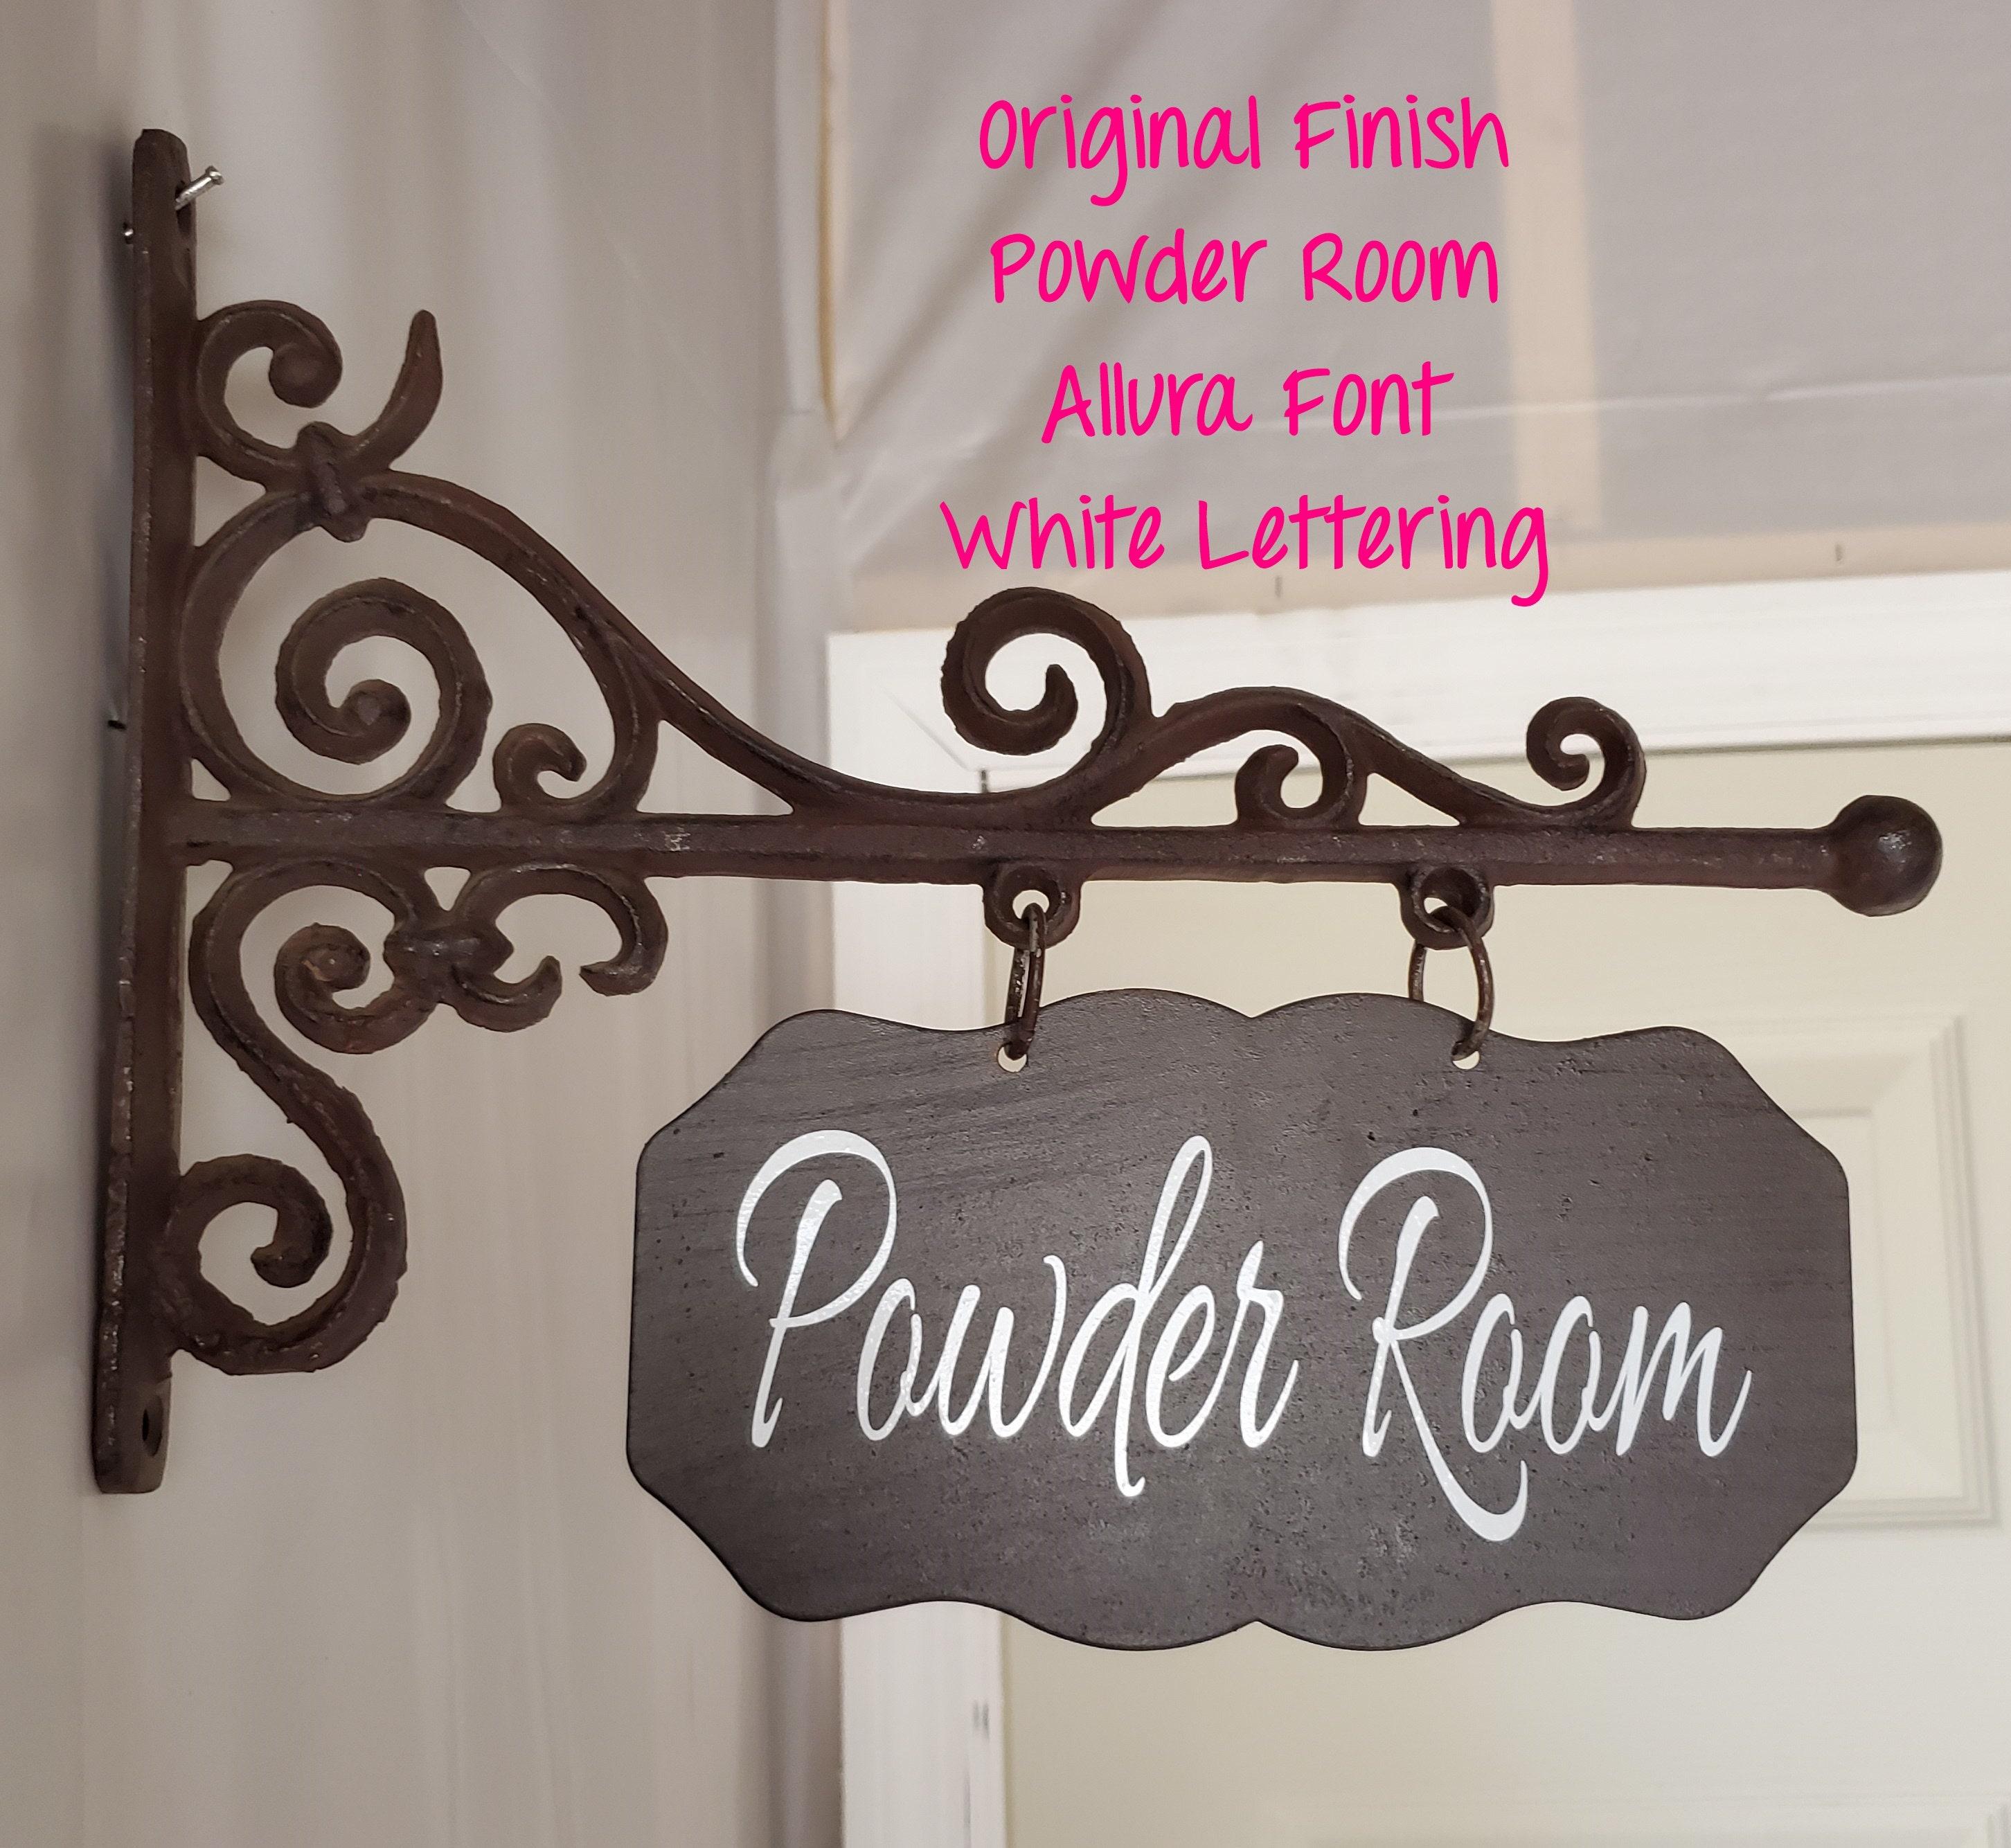 Room Sign//Door Sign//Powder Room//Bathroom//Laundry Room//Pantry//Office Customized Rectangular Metal Plaque and Bracket